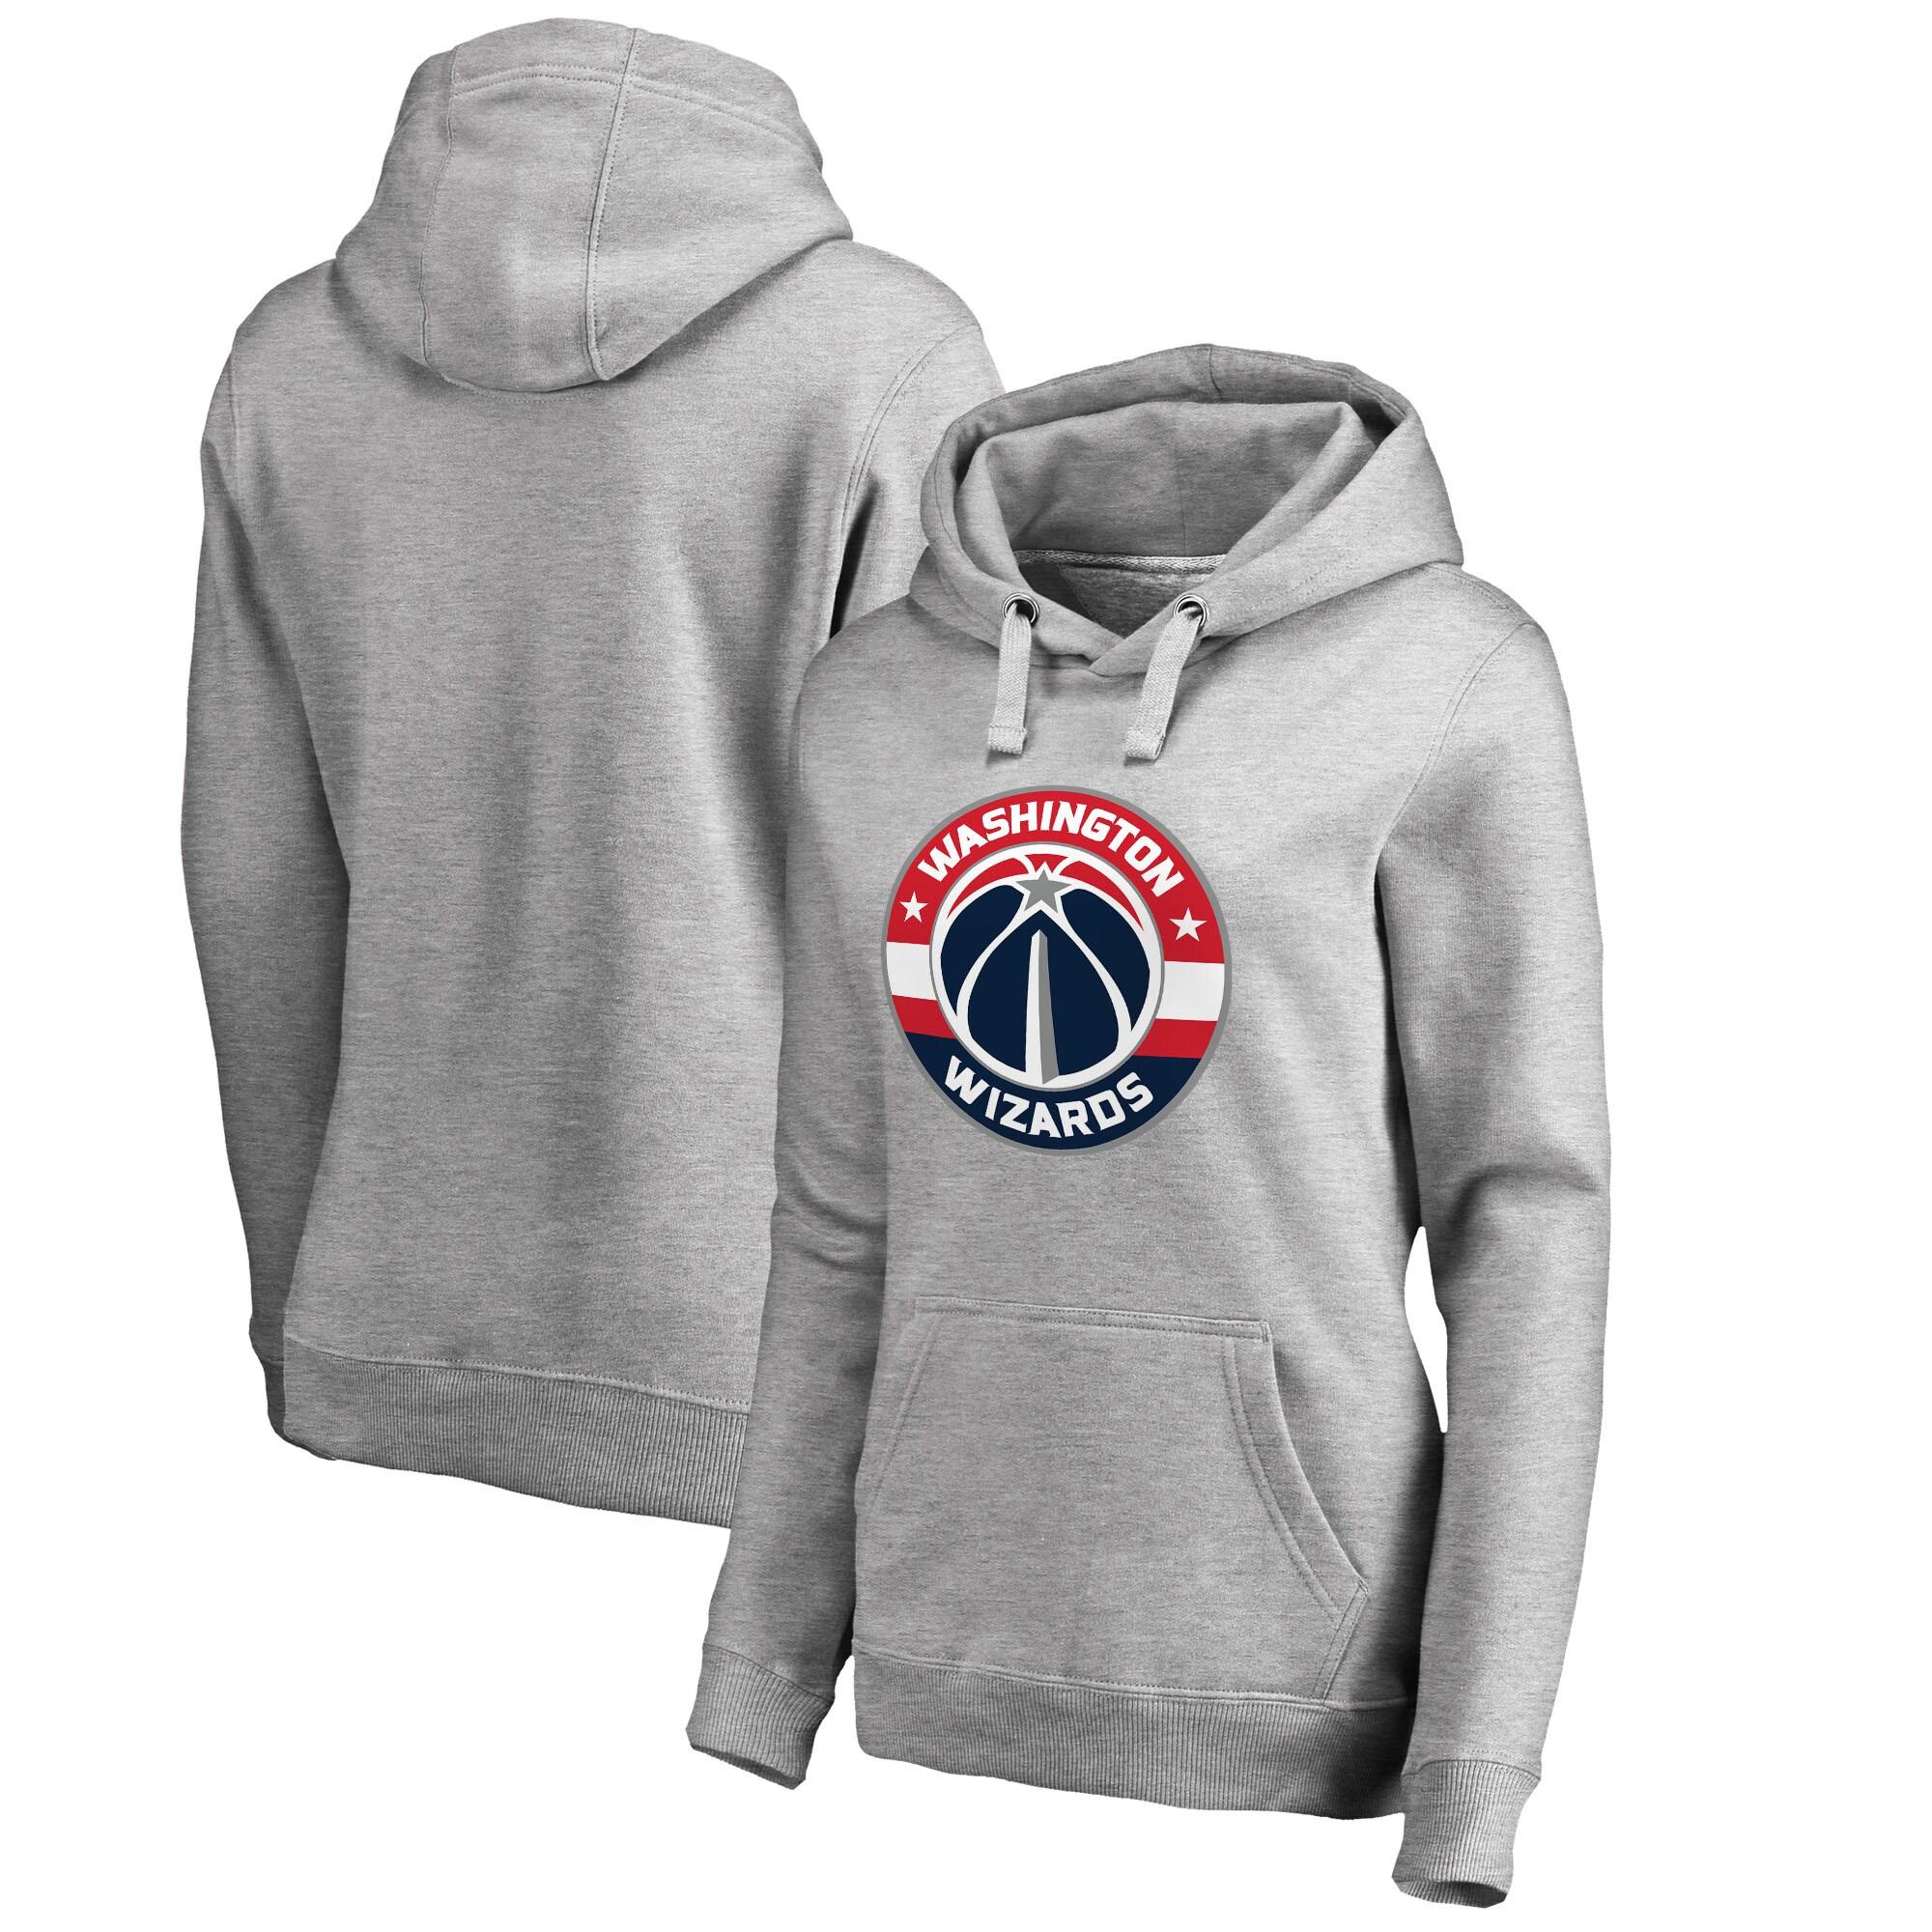 Washington Wizards Fanatics Branded Women's Primary Logo Pullover Hoodie - Ash